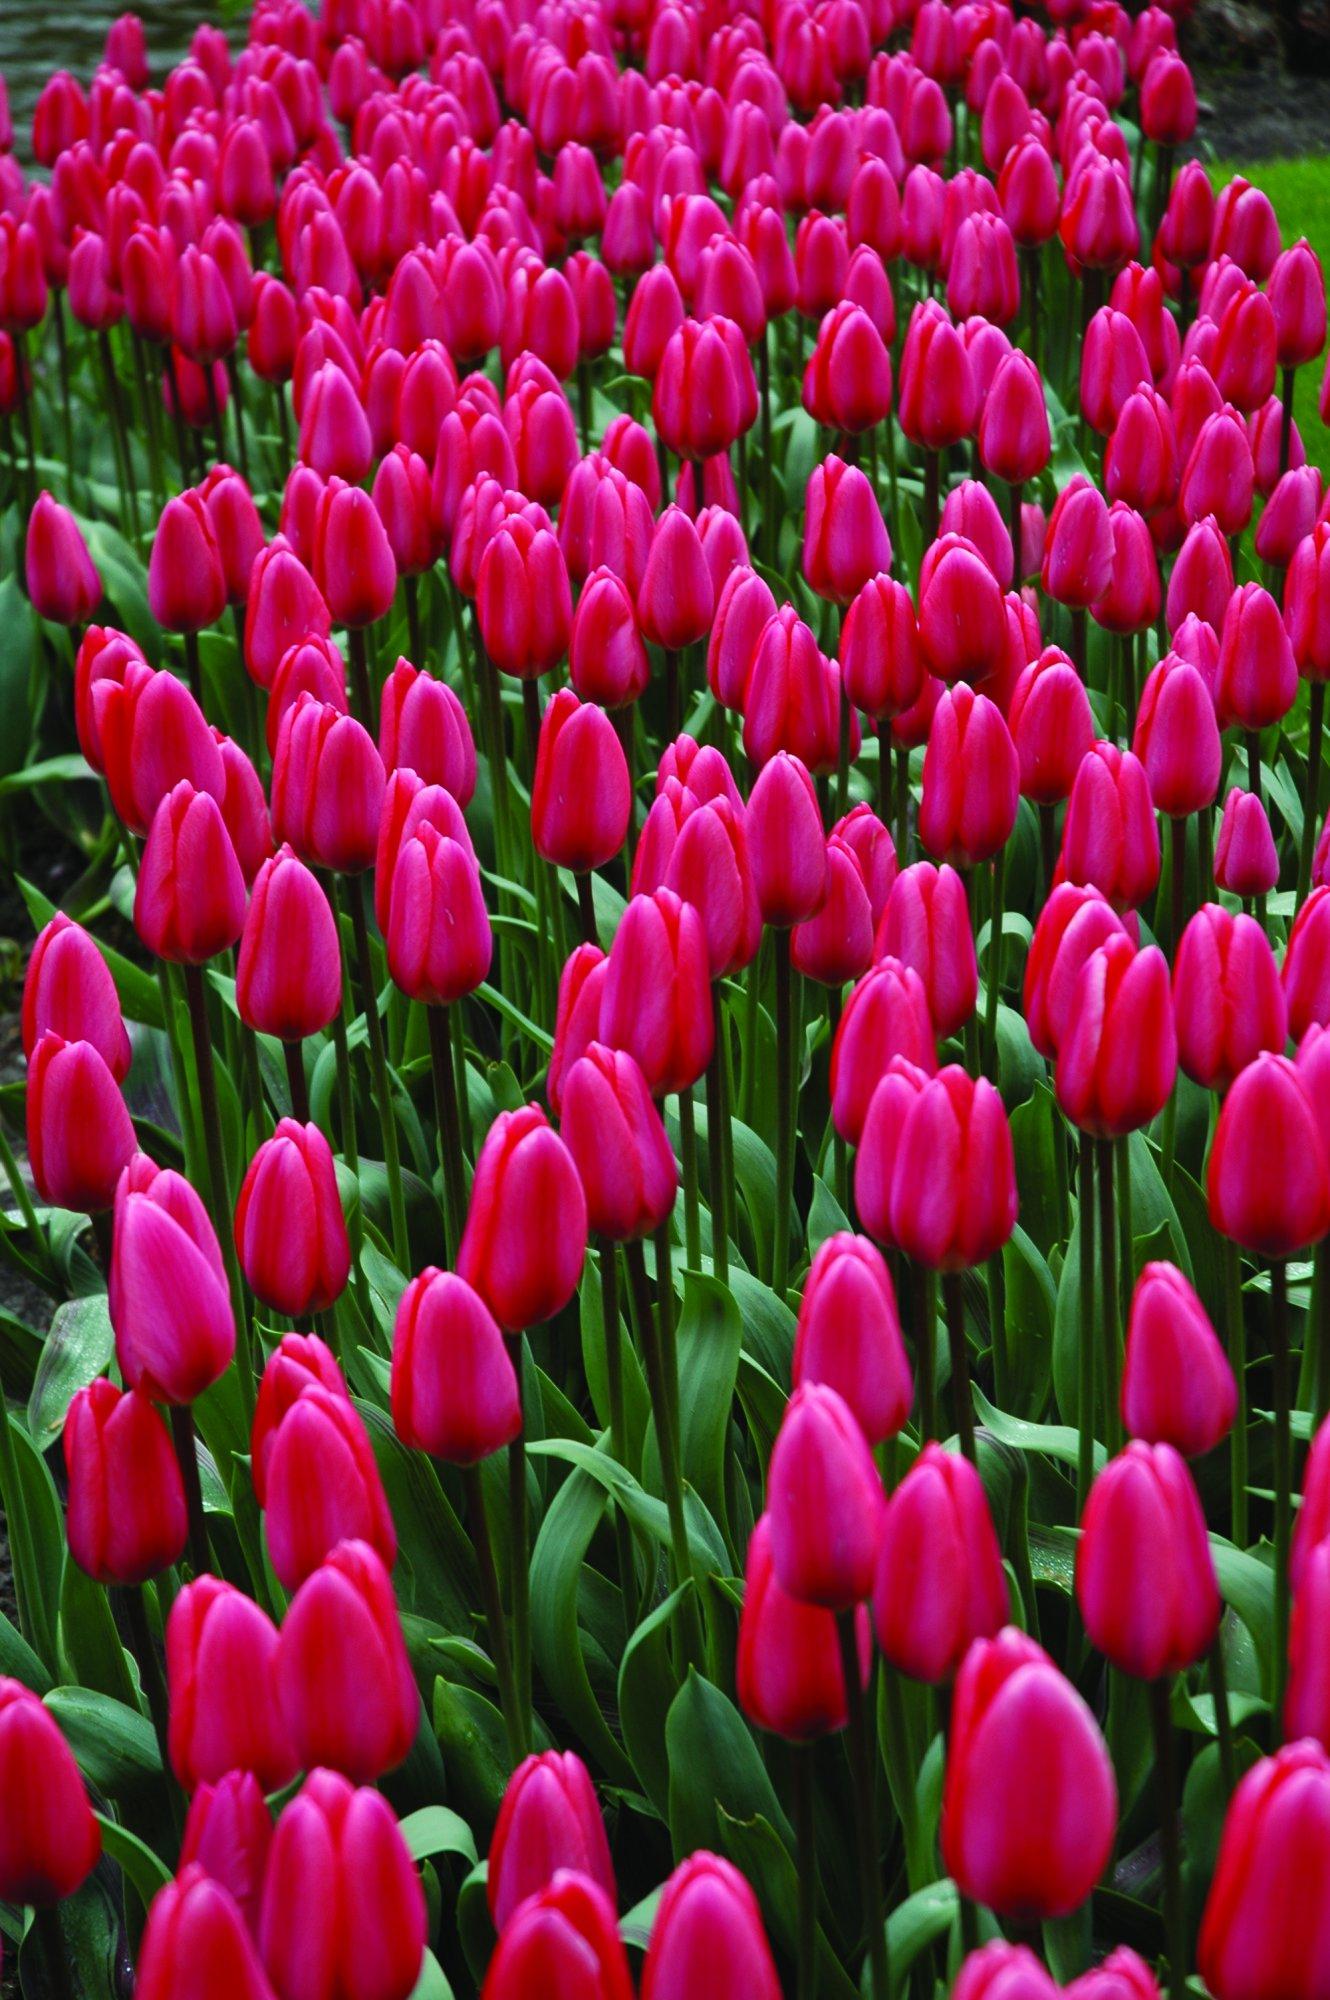 Burpee's Cosmopolitan Tulip - 10 Flower Bulbs   Light Pink   12 - 14cm Bulb Diameter